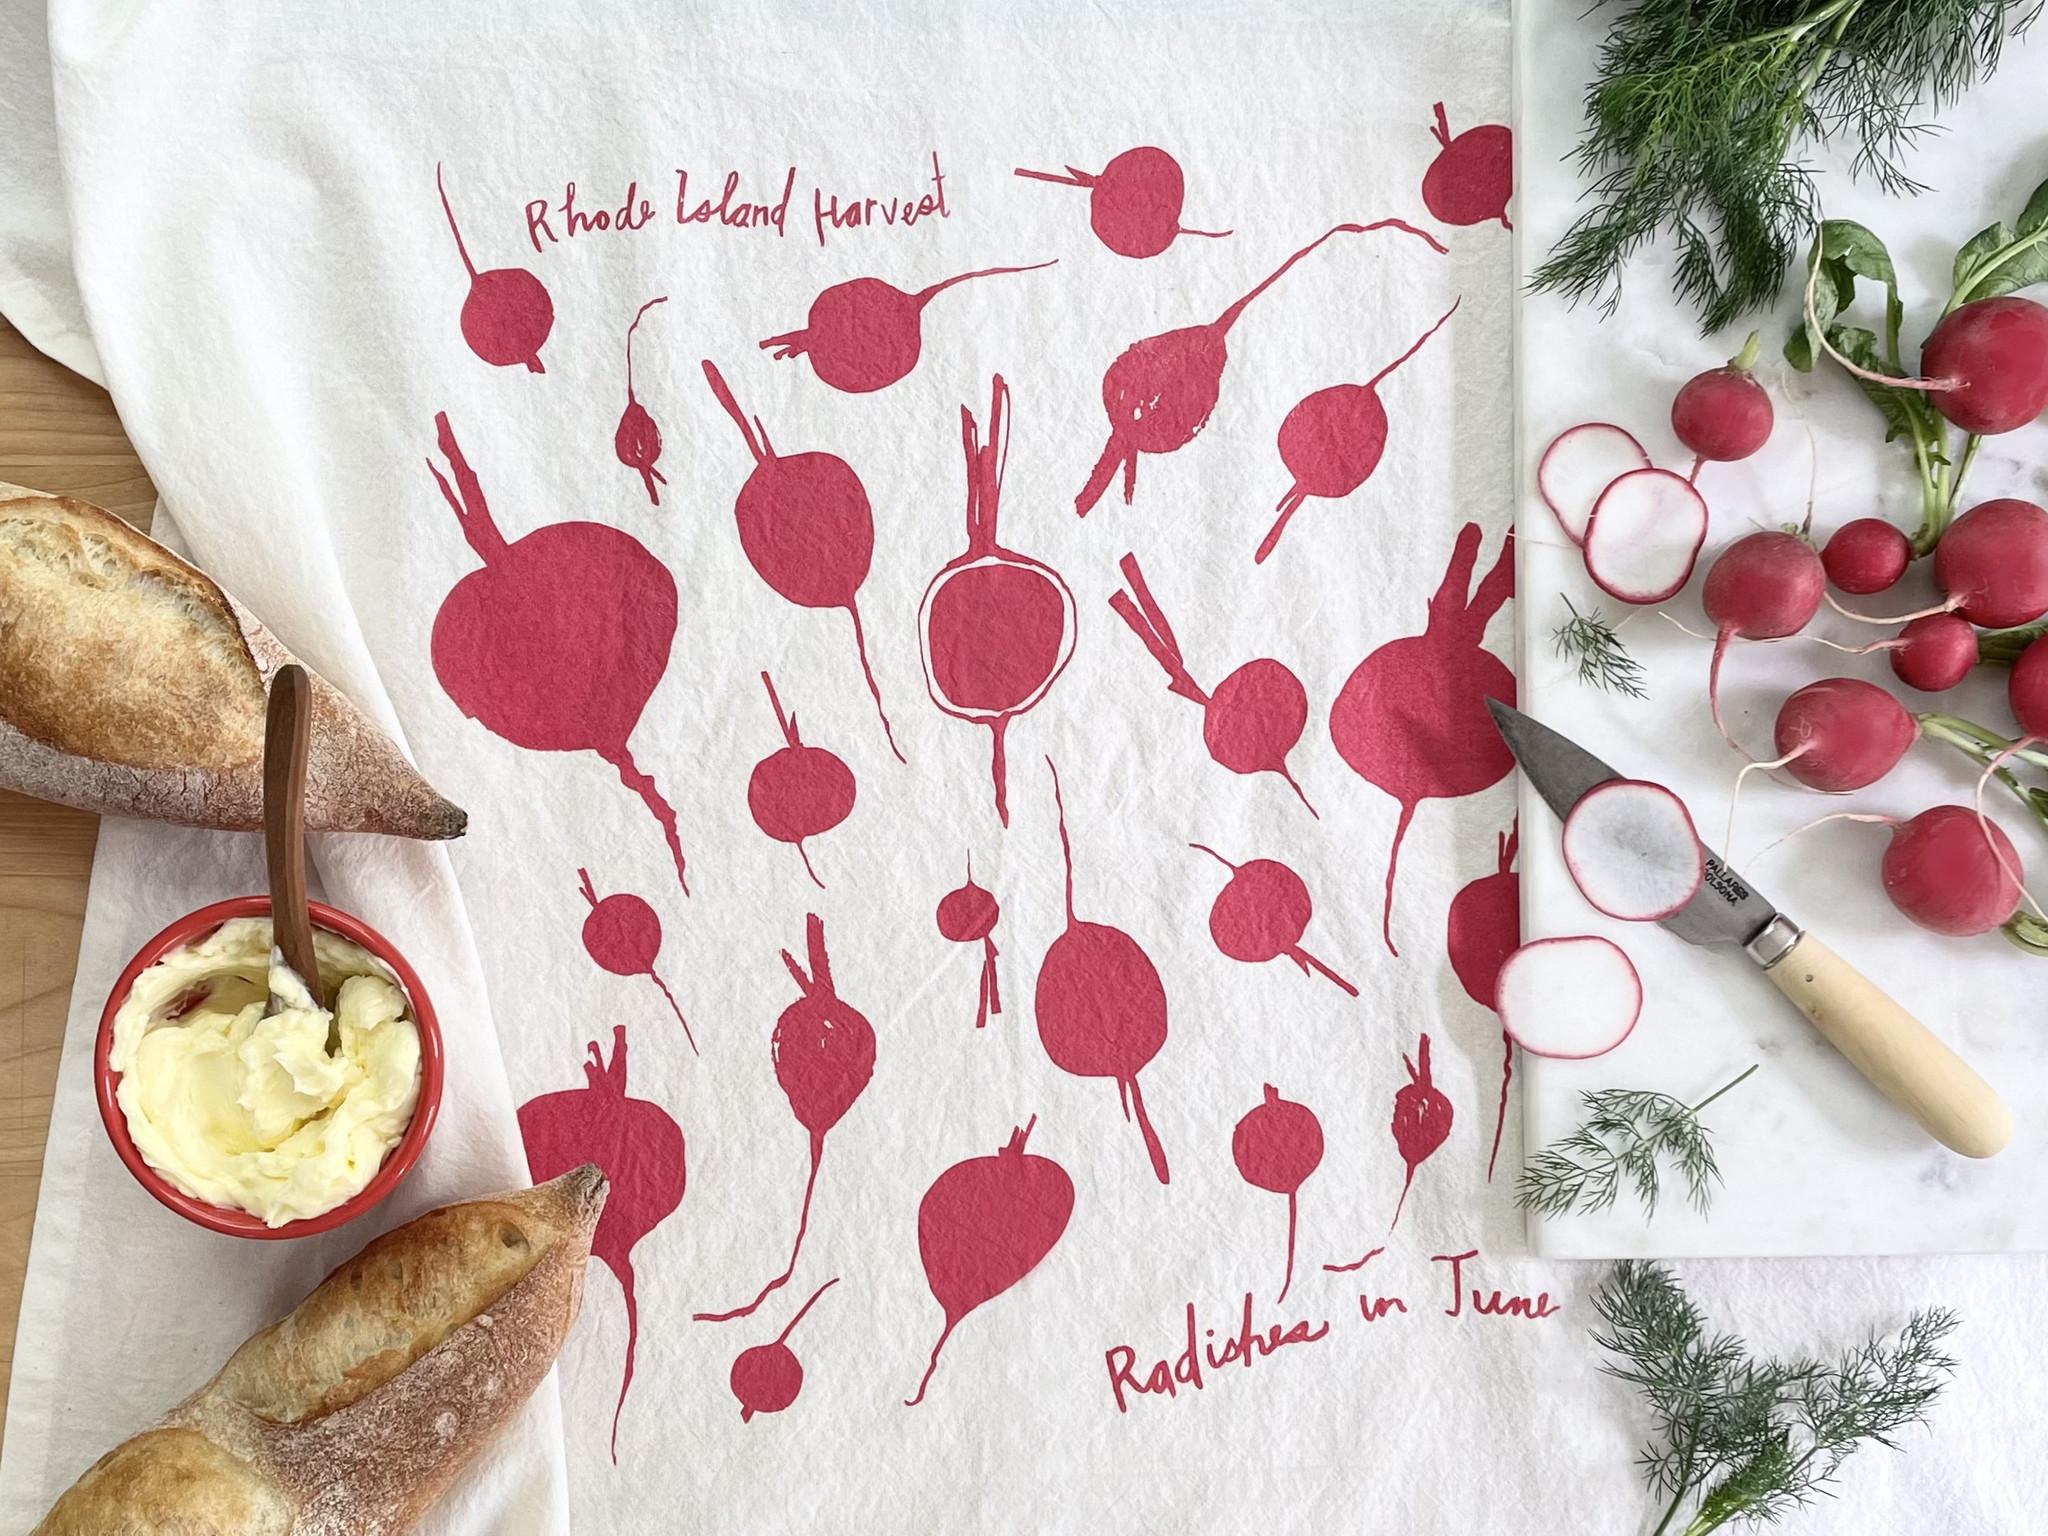 Rhode Island Harvest Tea Towels by Cricicis Design-4